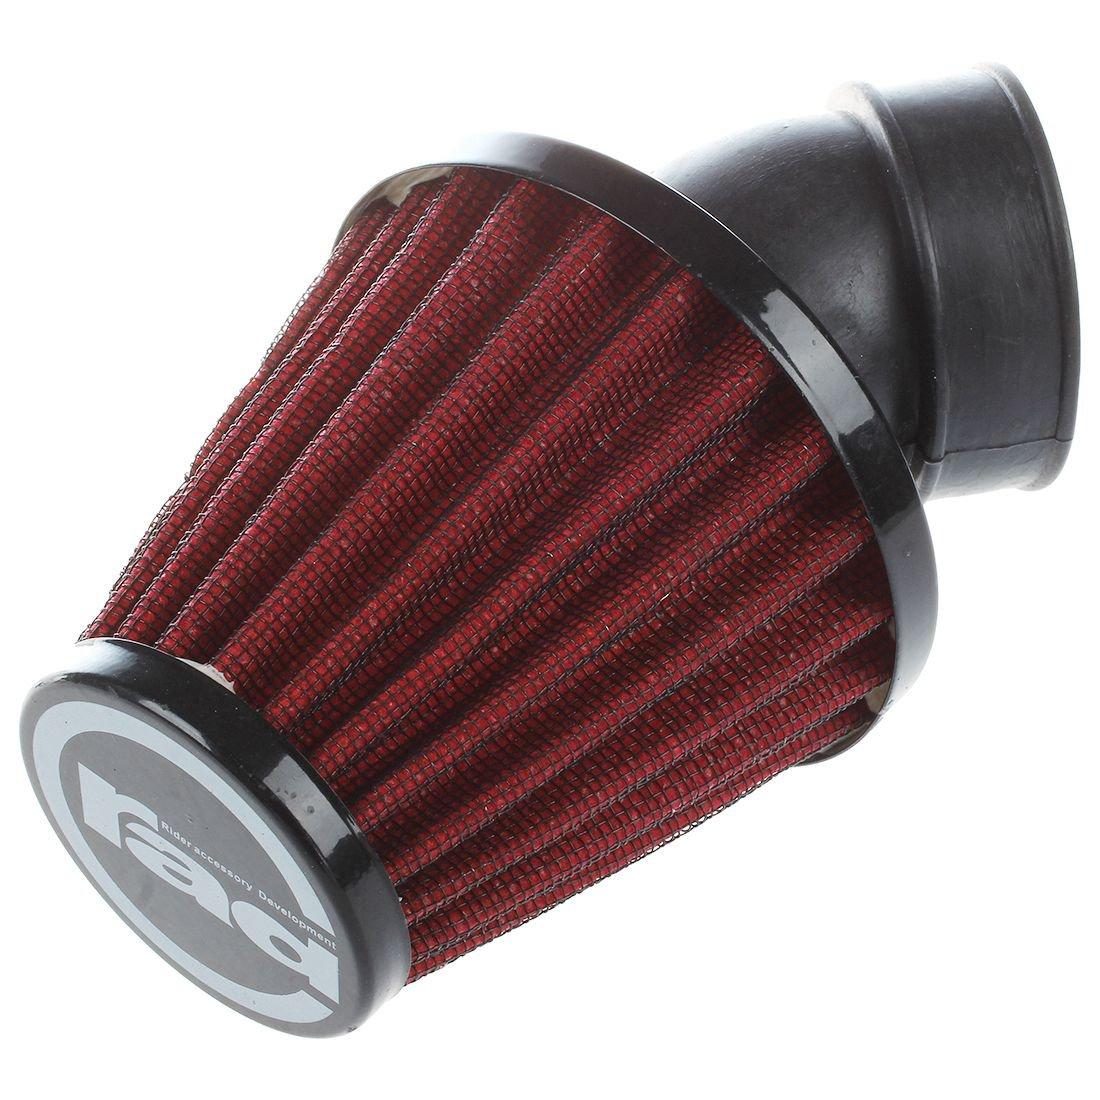 Mushroom Head Air Intake Filter Cleaner R SODIAL 38mm, Red